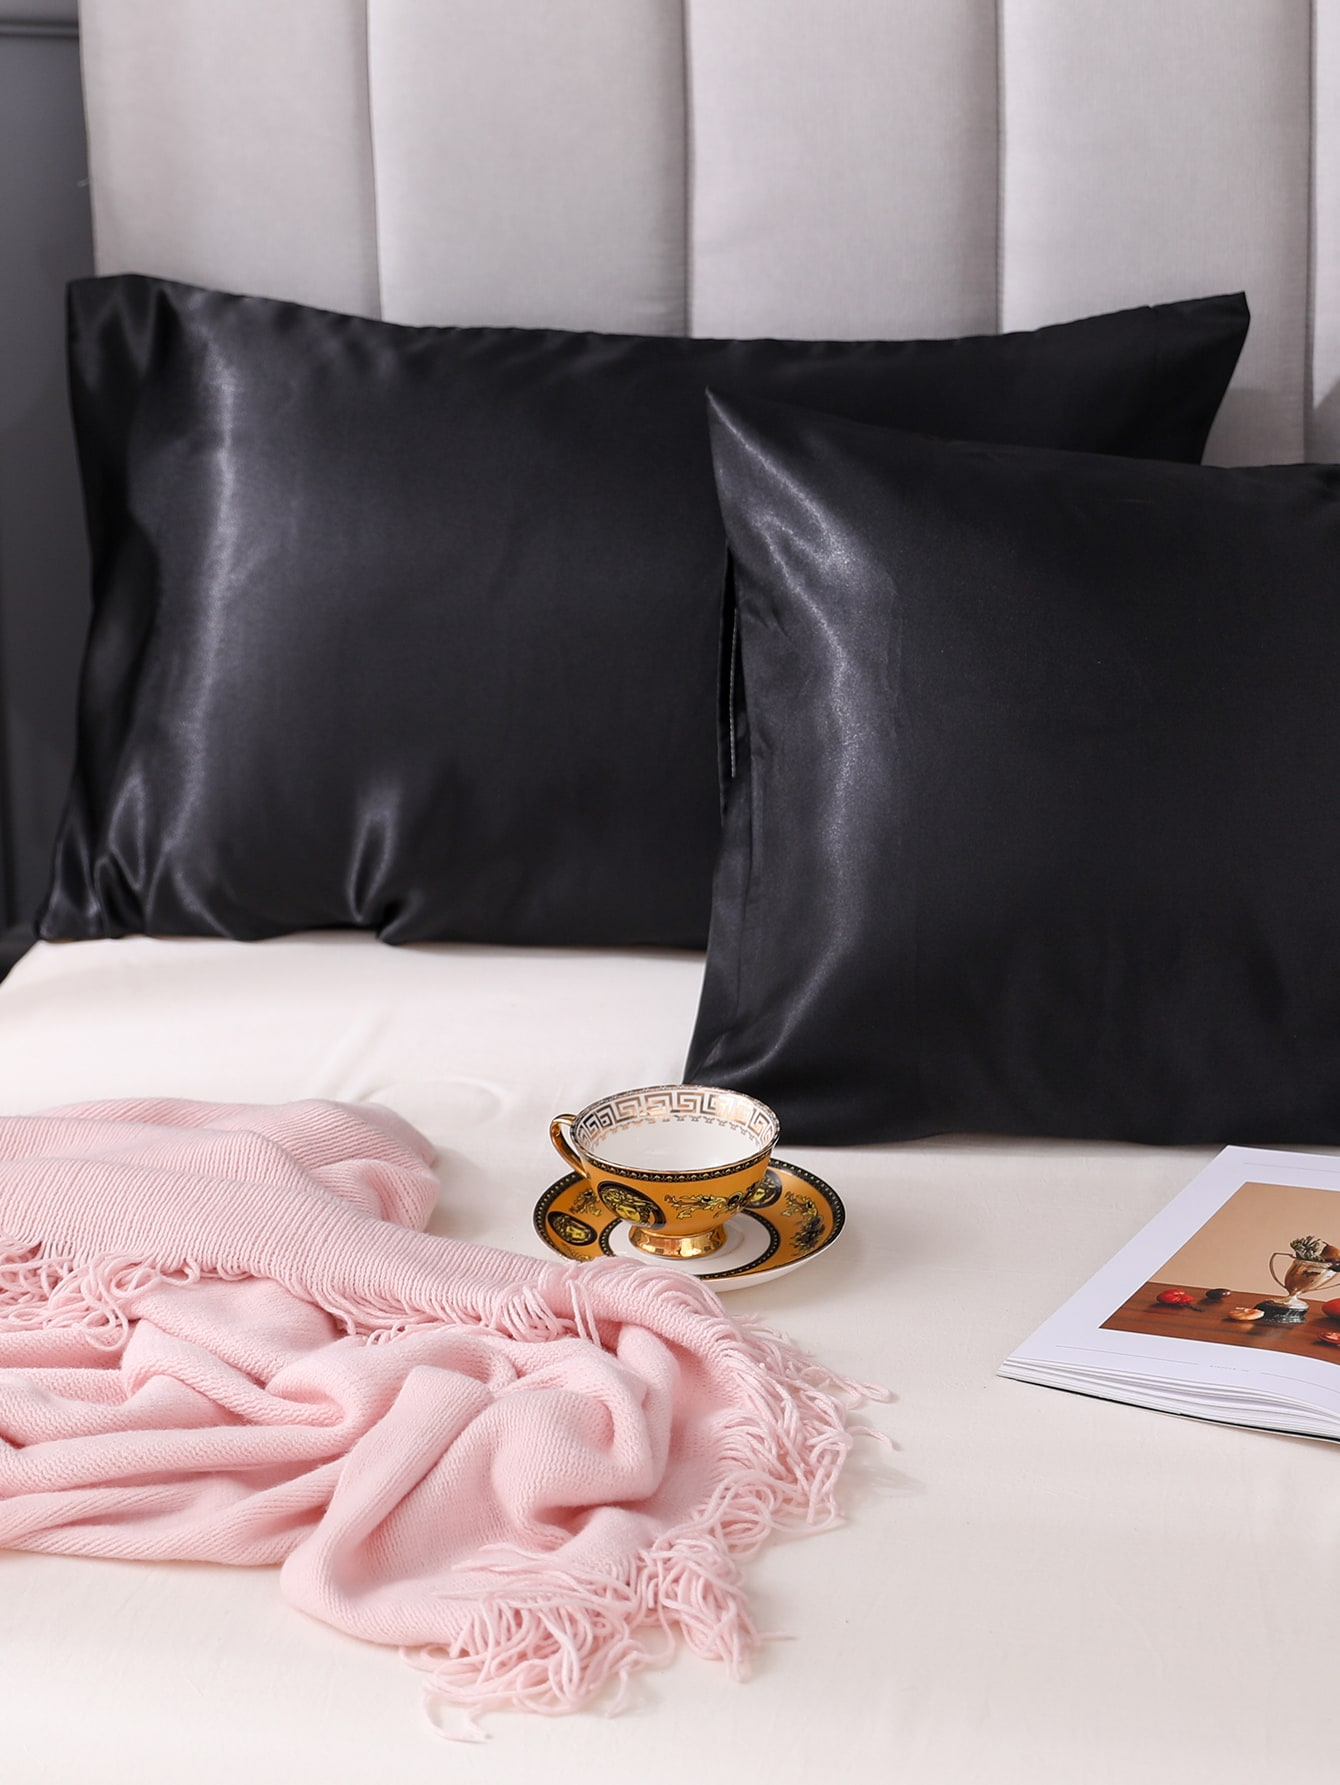 1Pair Plain Satin Pillowcase